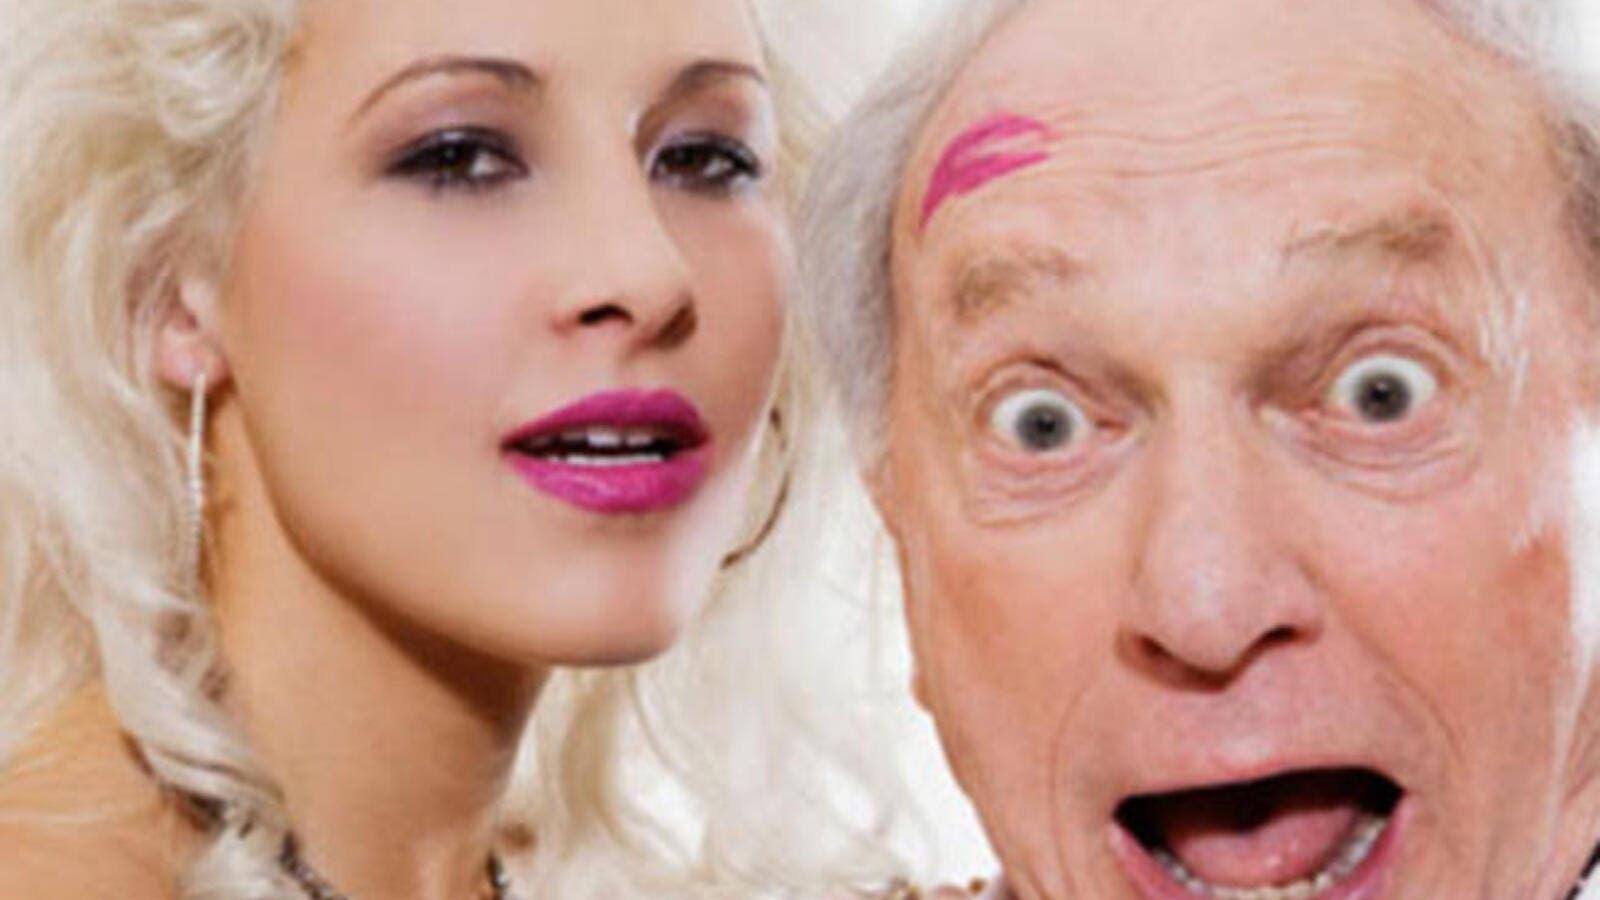 5405749784ffc الفارق في السن بين الازواج مضر بالصحة